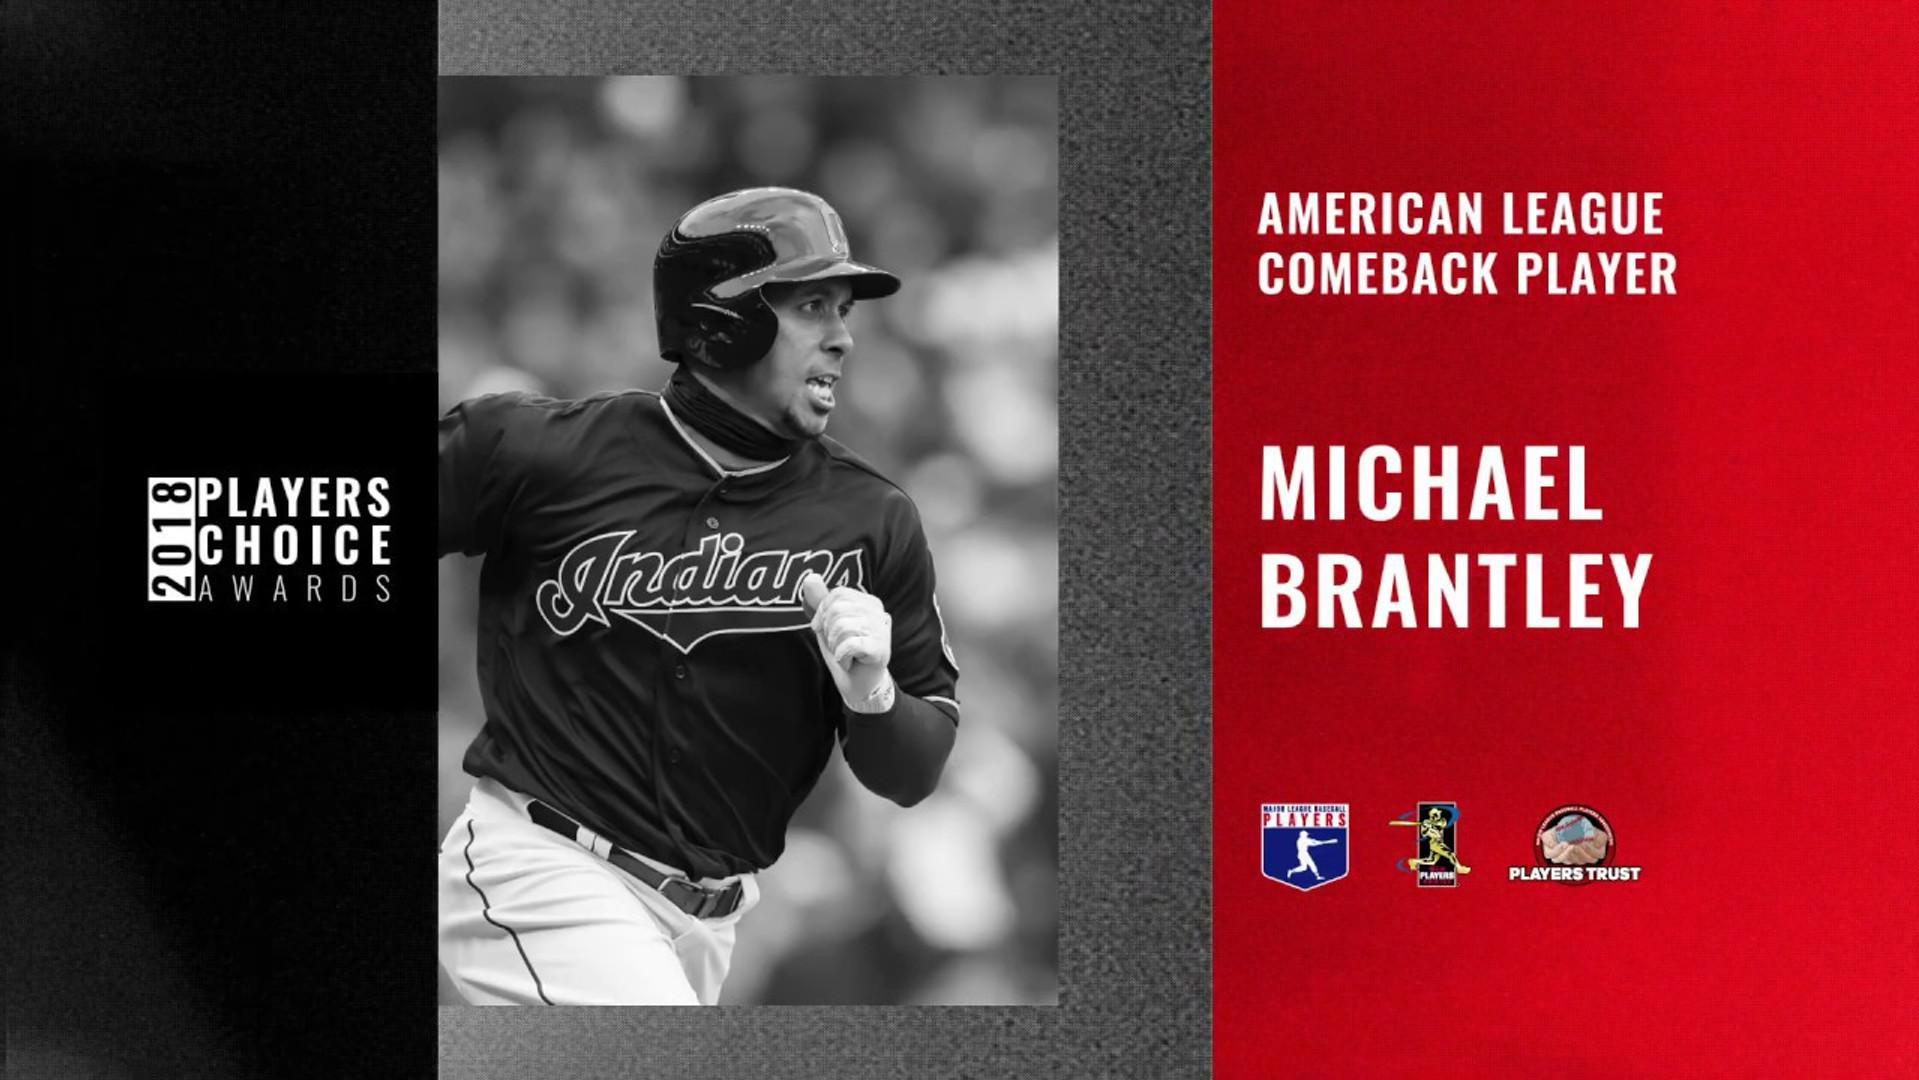 2018 AL Comeback Player | Michael Brantley